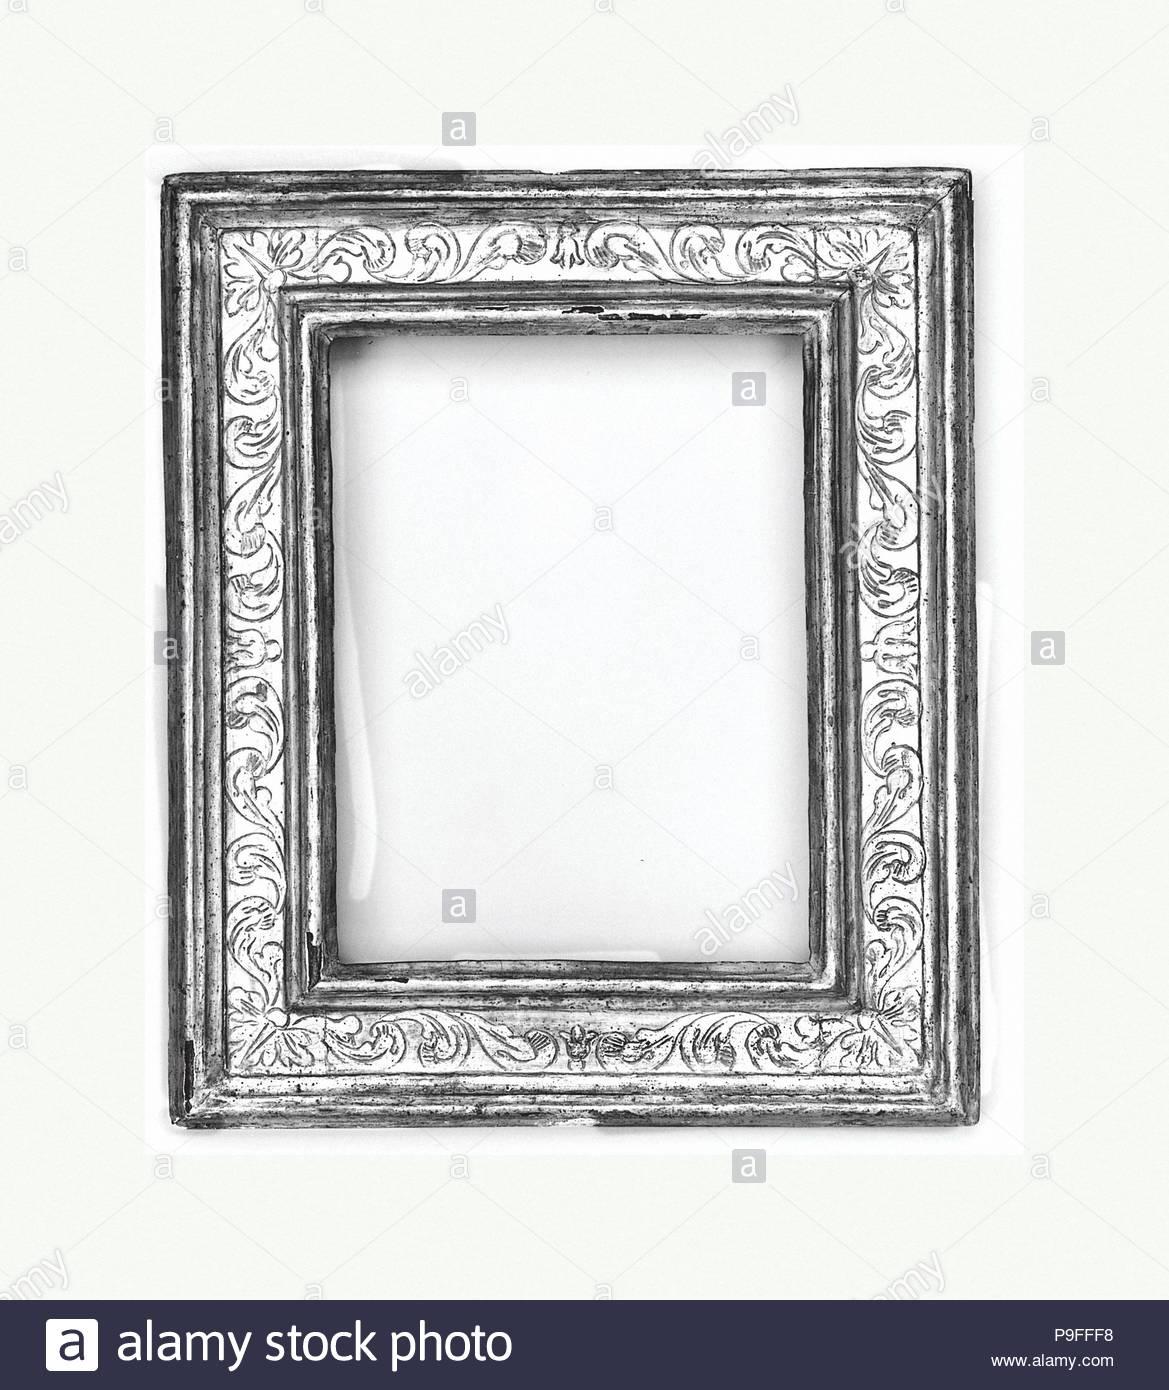 Cassetta frame, mid-to-late 18th century, style mid-17th century, Italian, Bologna, Poplar, 43.5 x 37, 28 x 21.2, 29.3 x 22.3 cm., Frames. - Stock Image